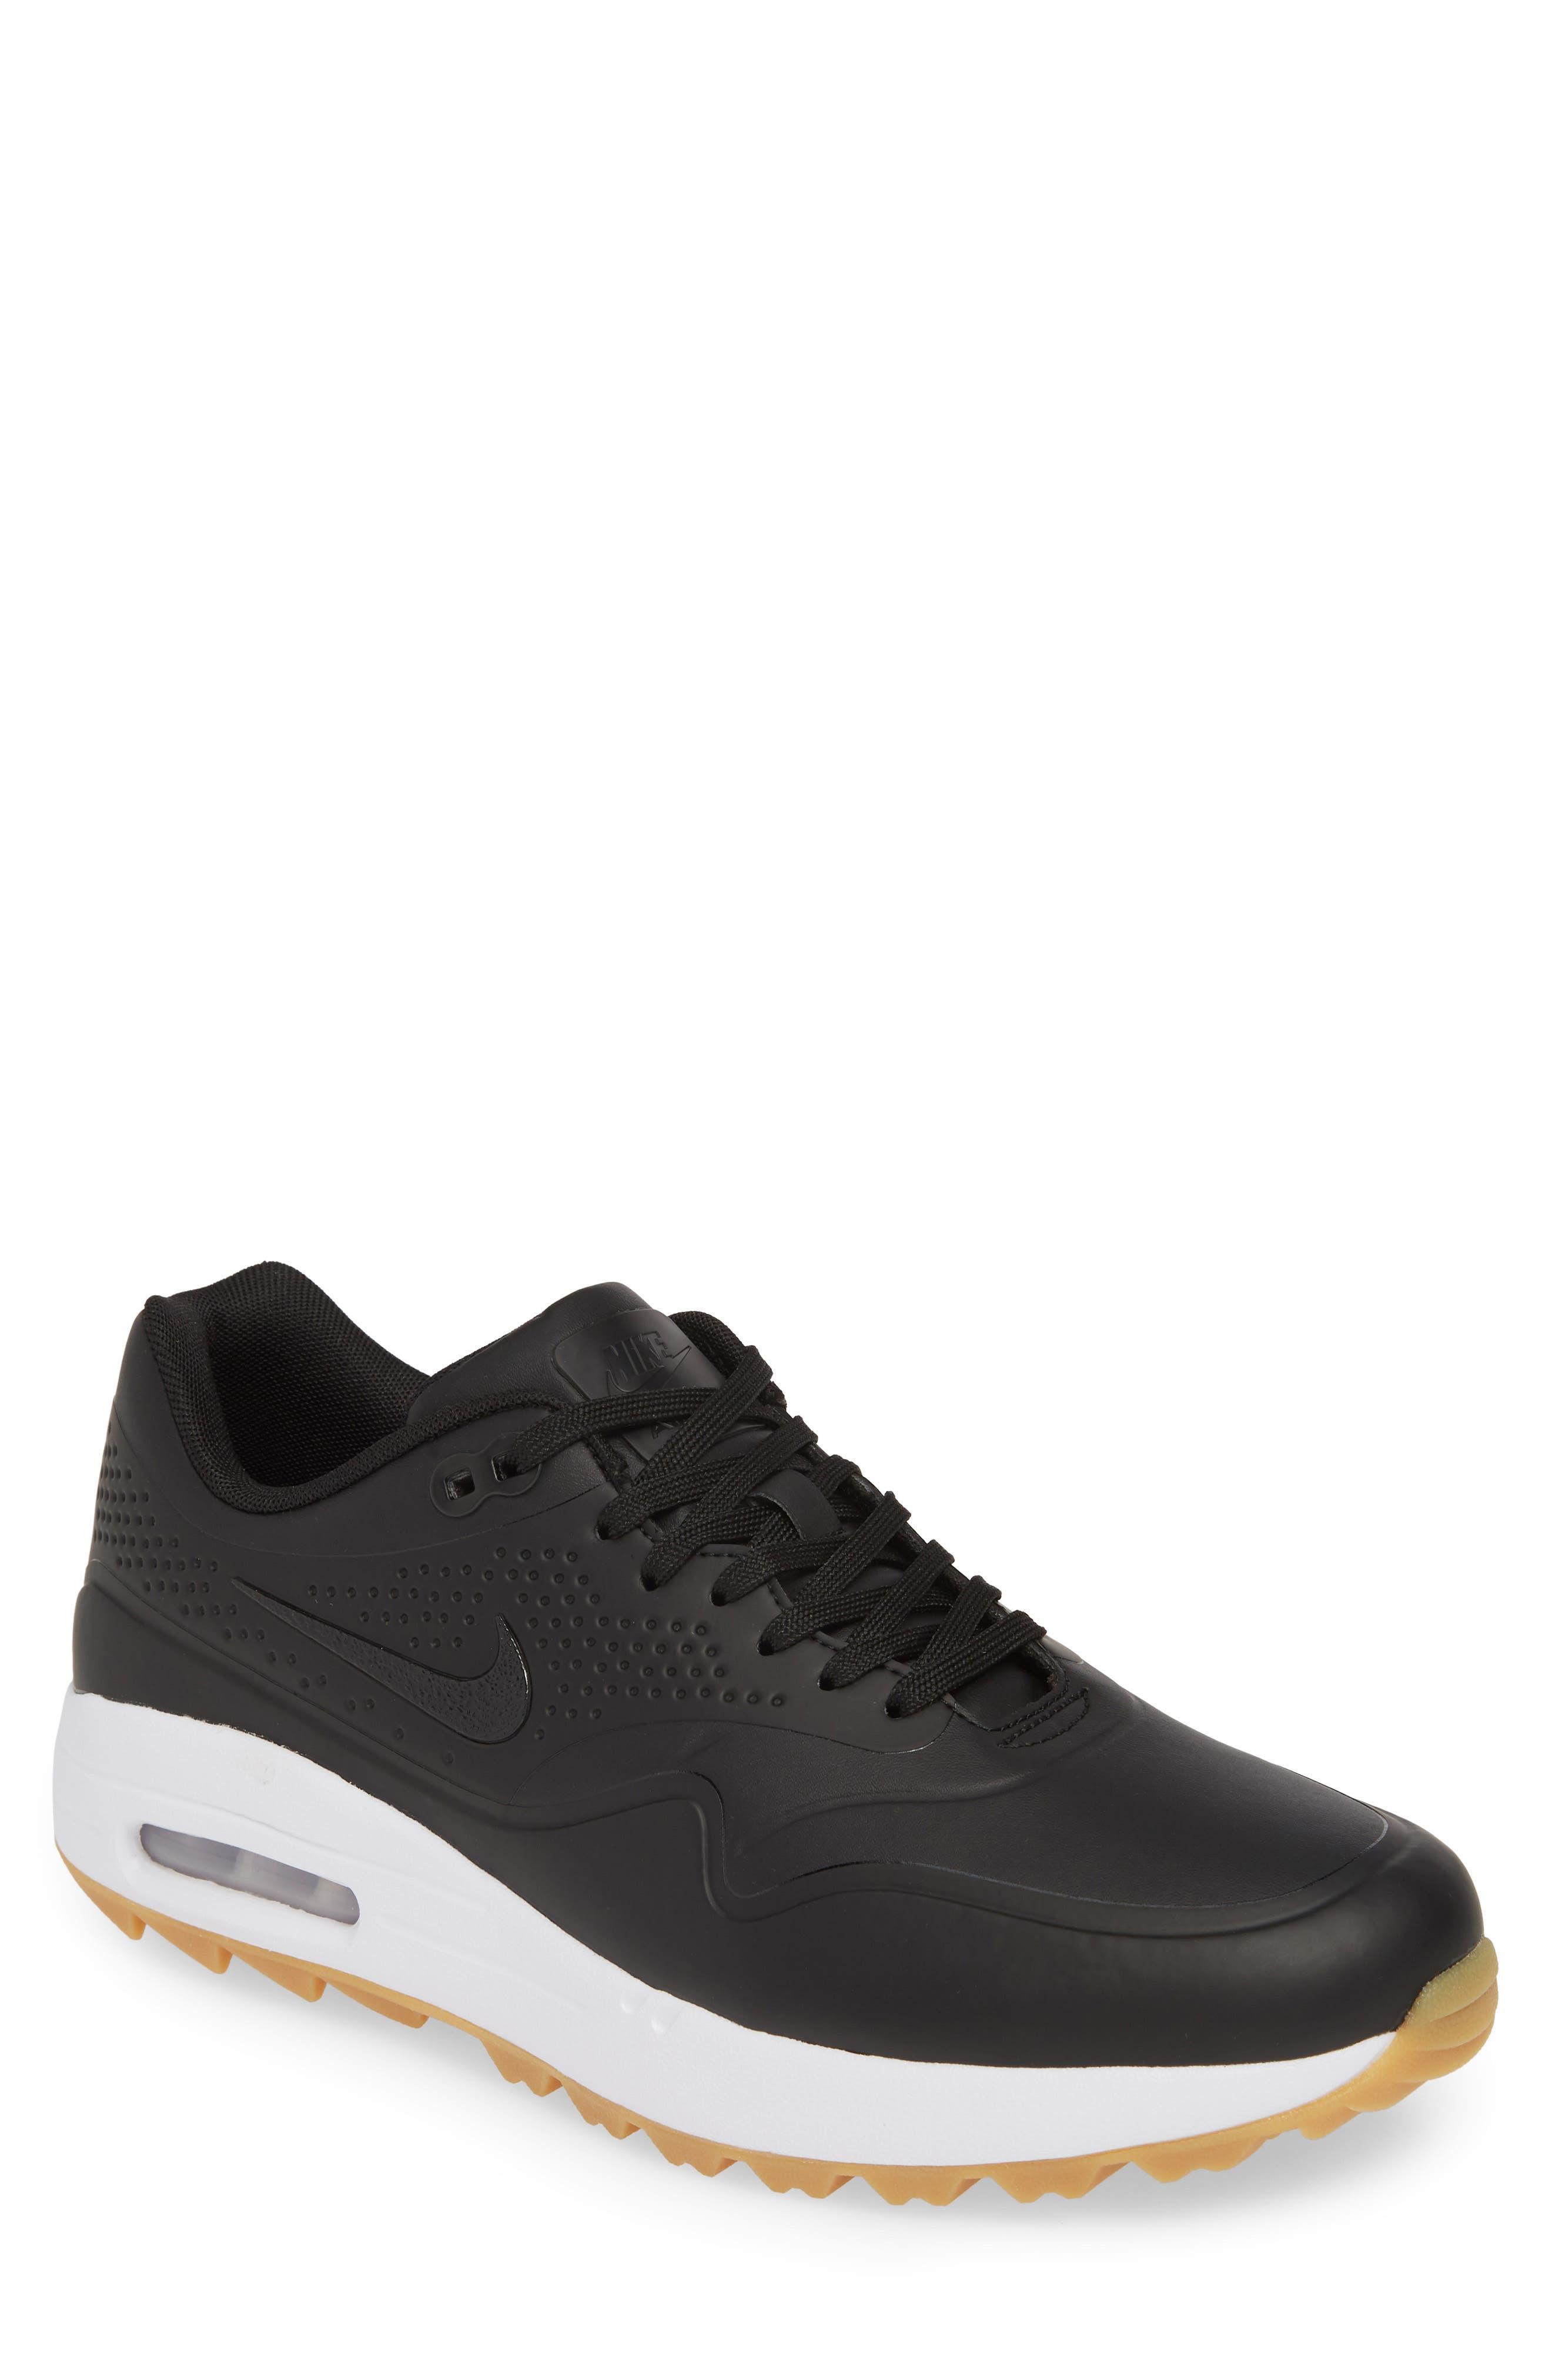 NIKE, Air Max 1 Golf Sneaker, Main thumbnail 1, color, BLACK/ GUM LIGHT BROWN